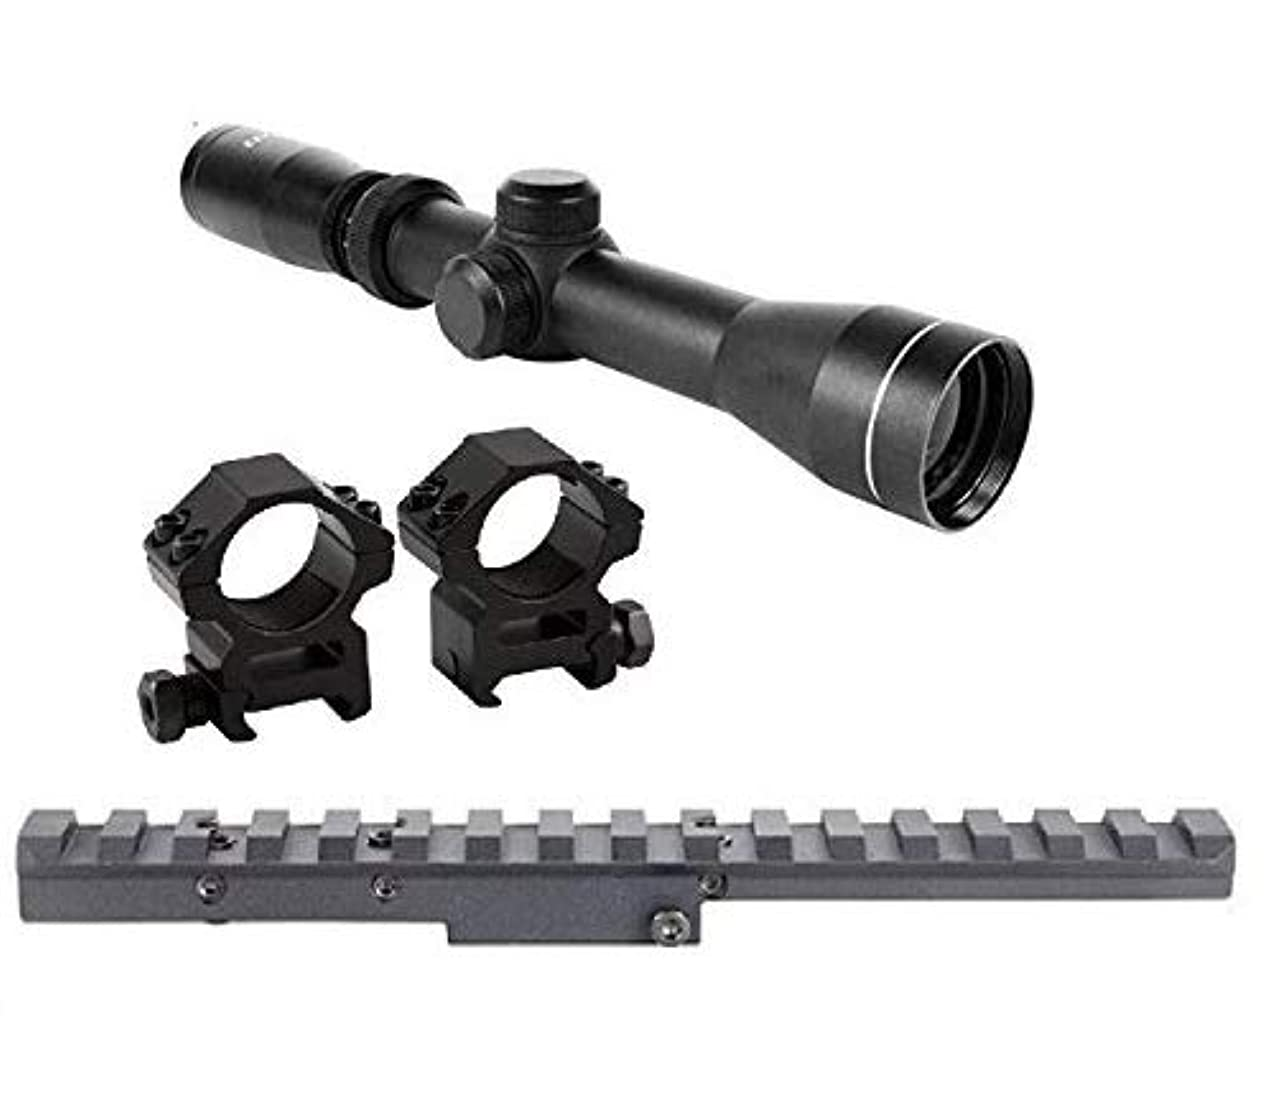 GOTICAL Combo of Mosin Nagant 2-7x32 Long Eye Relief Scope + Scout Rail Mount for Mosin Nagant 91/30 M38 M44 1891 91/30 1891/30 Rifles +1 Inch Ring xqpbxqsq436